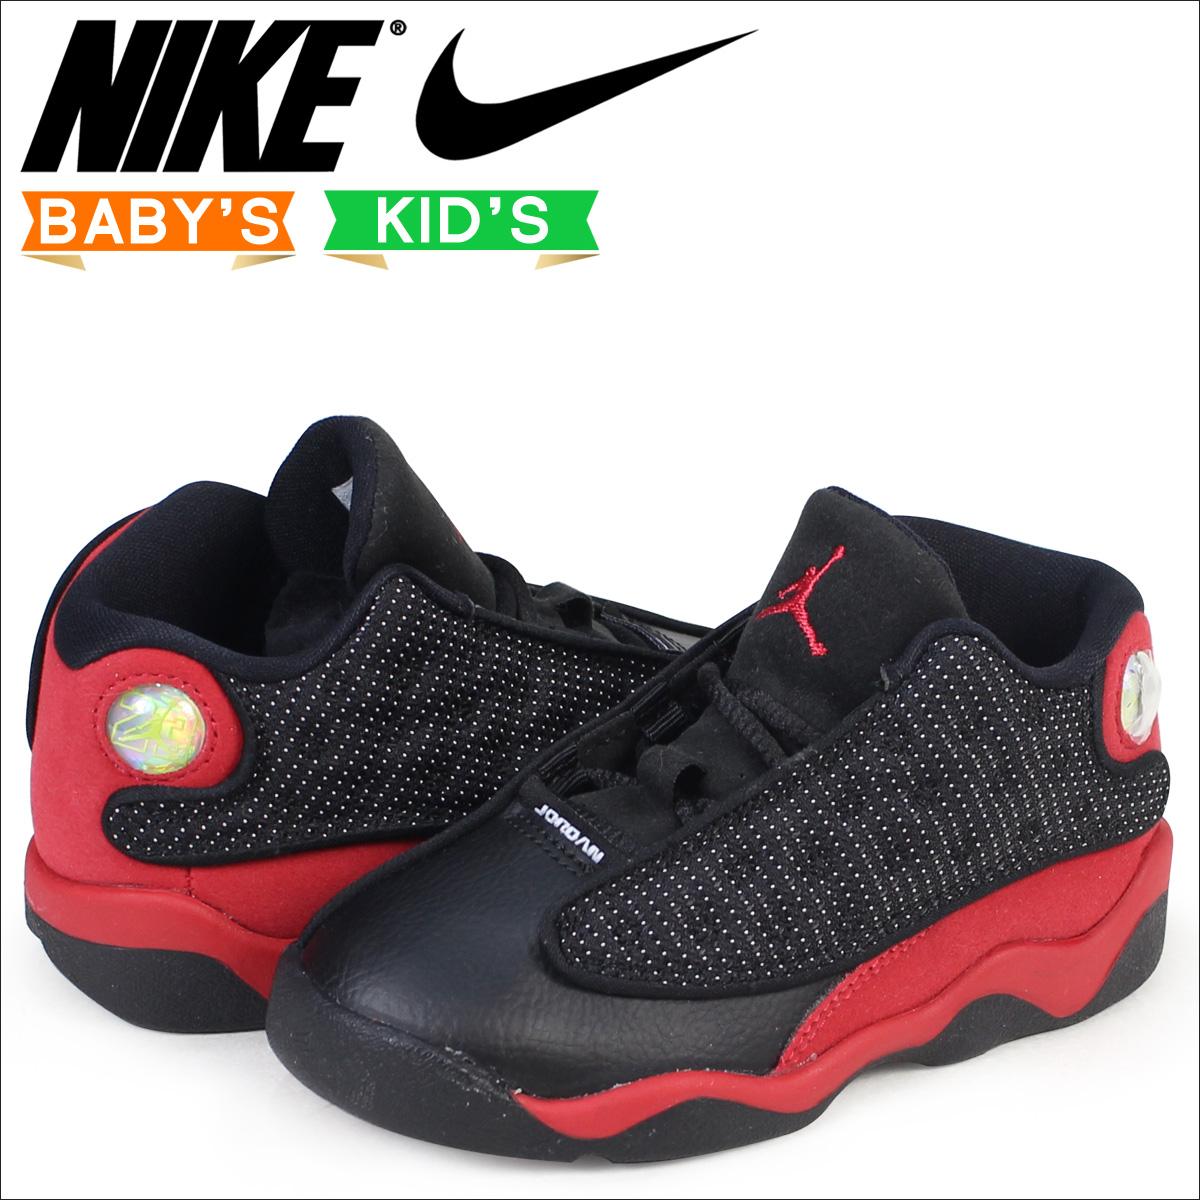 Nike NIKE Air Jordan 13 nostalgic baby sneakers AIR JORDAN 13 RETRO BT  414,581-004 shoes black [load planned Shinnyu load in reservation product  9/9 ...